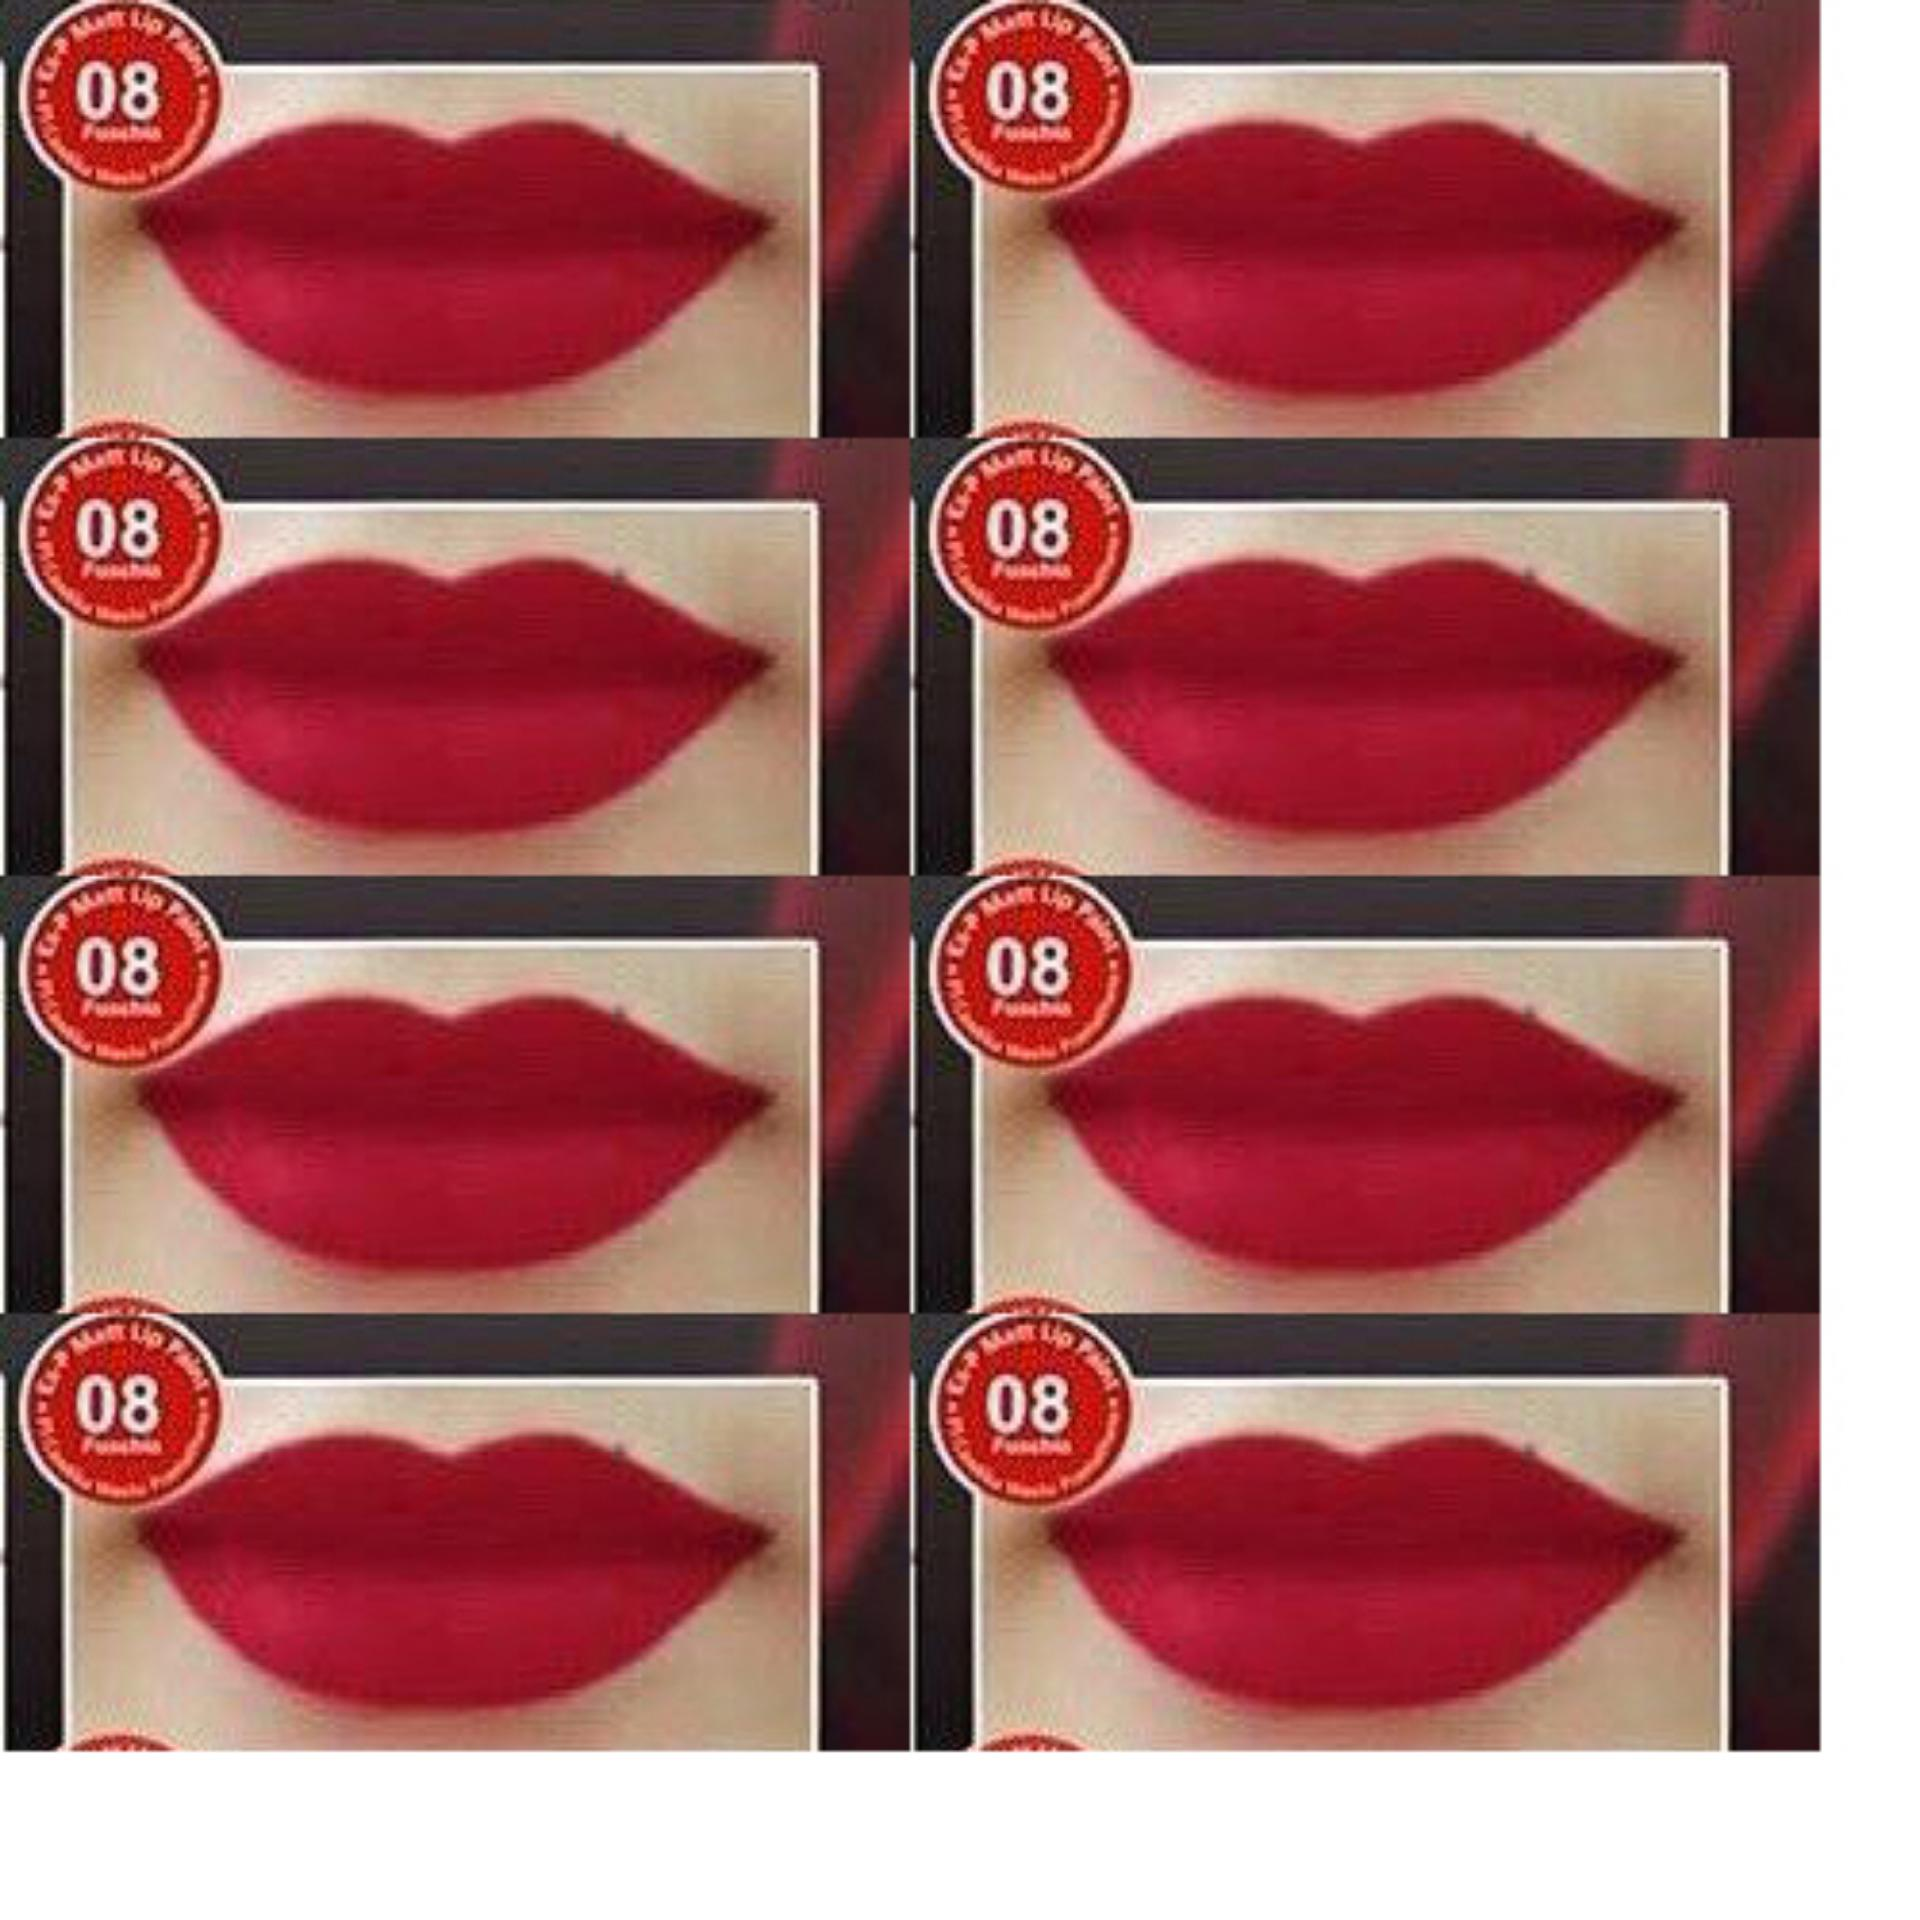 Aubeau Ex-P Matt Lip Paint (08 Fuschia) - Warna Pigmented Lipstick Matte